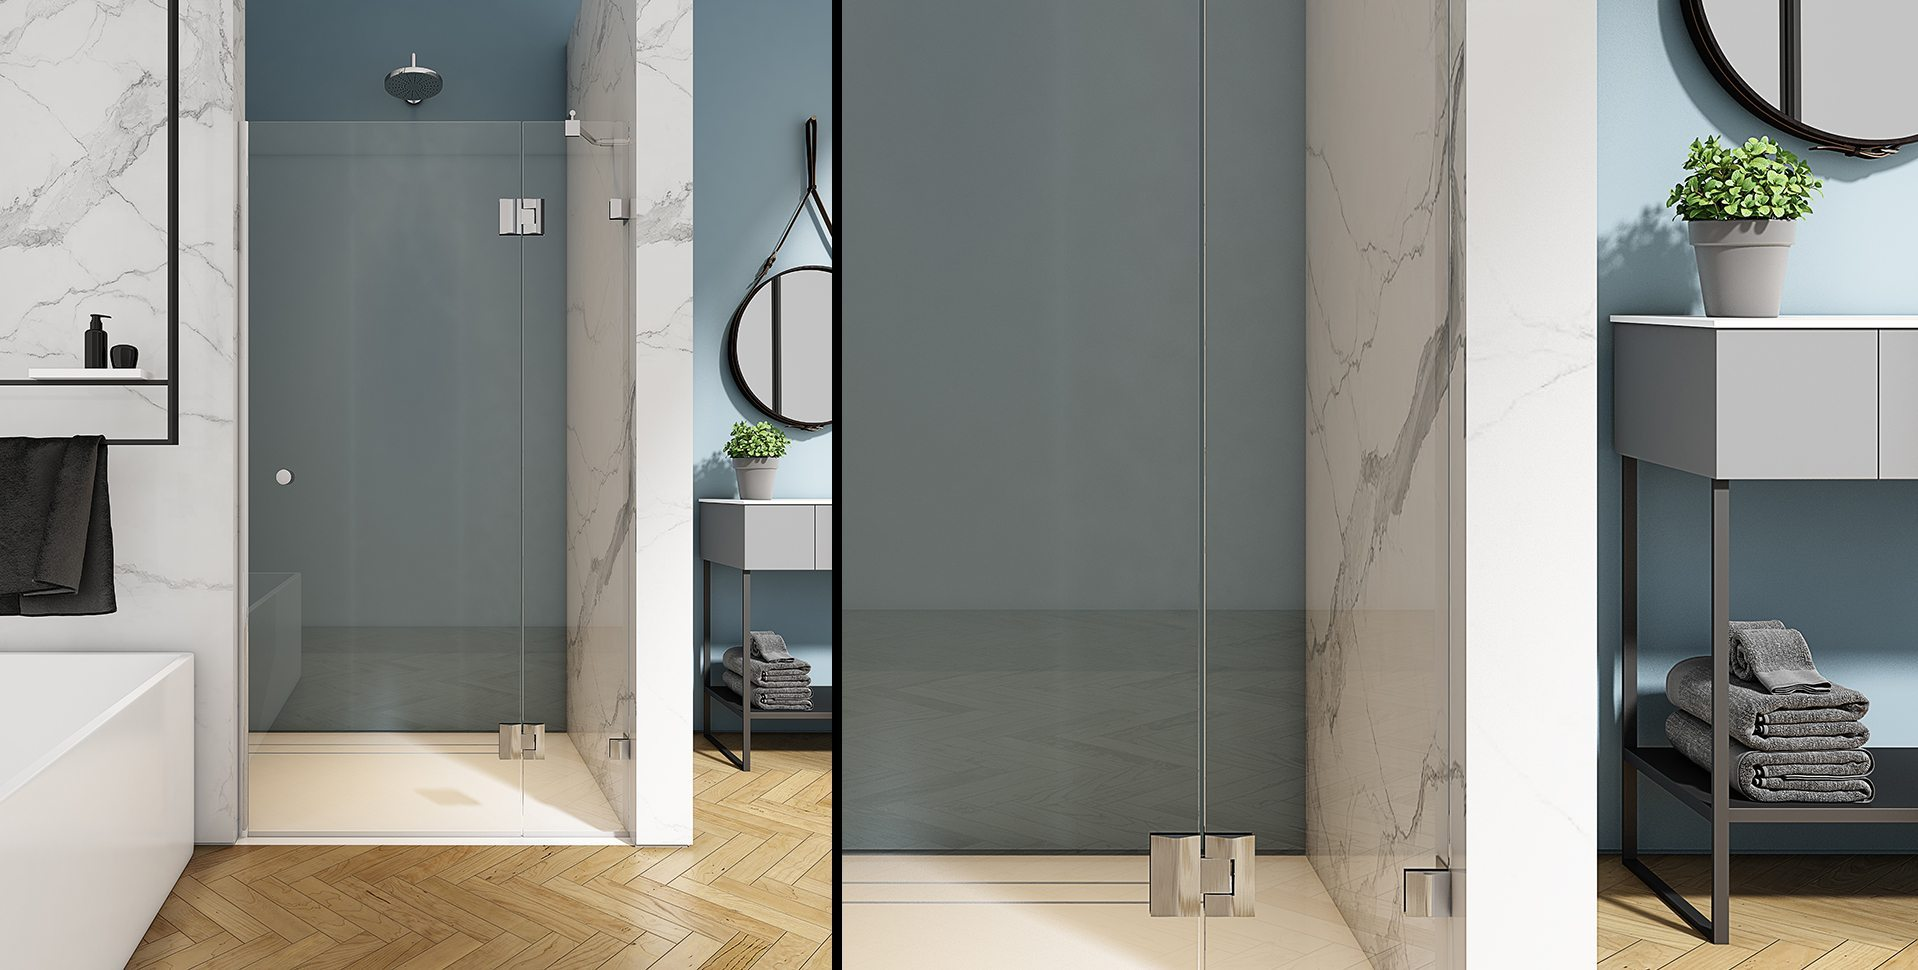 Product Visualization: Shower by El-Gal, Bathroom interior Design